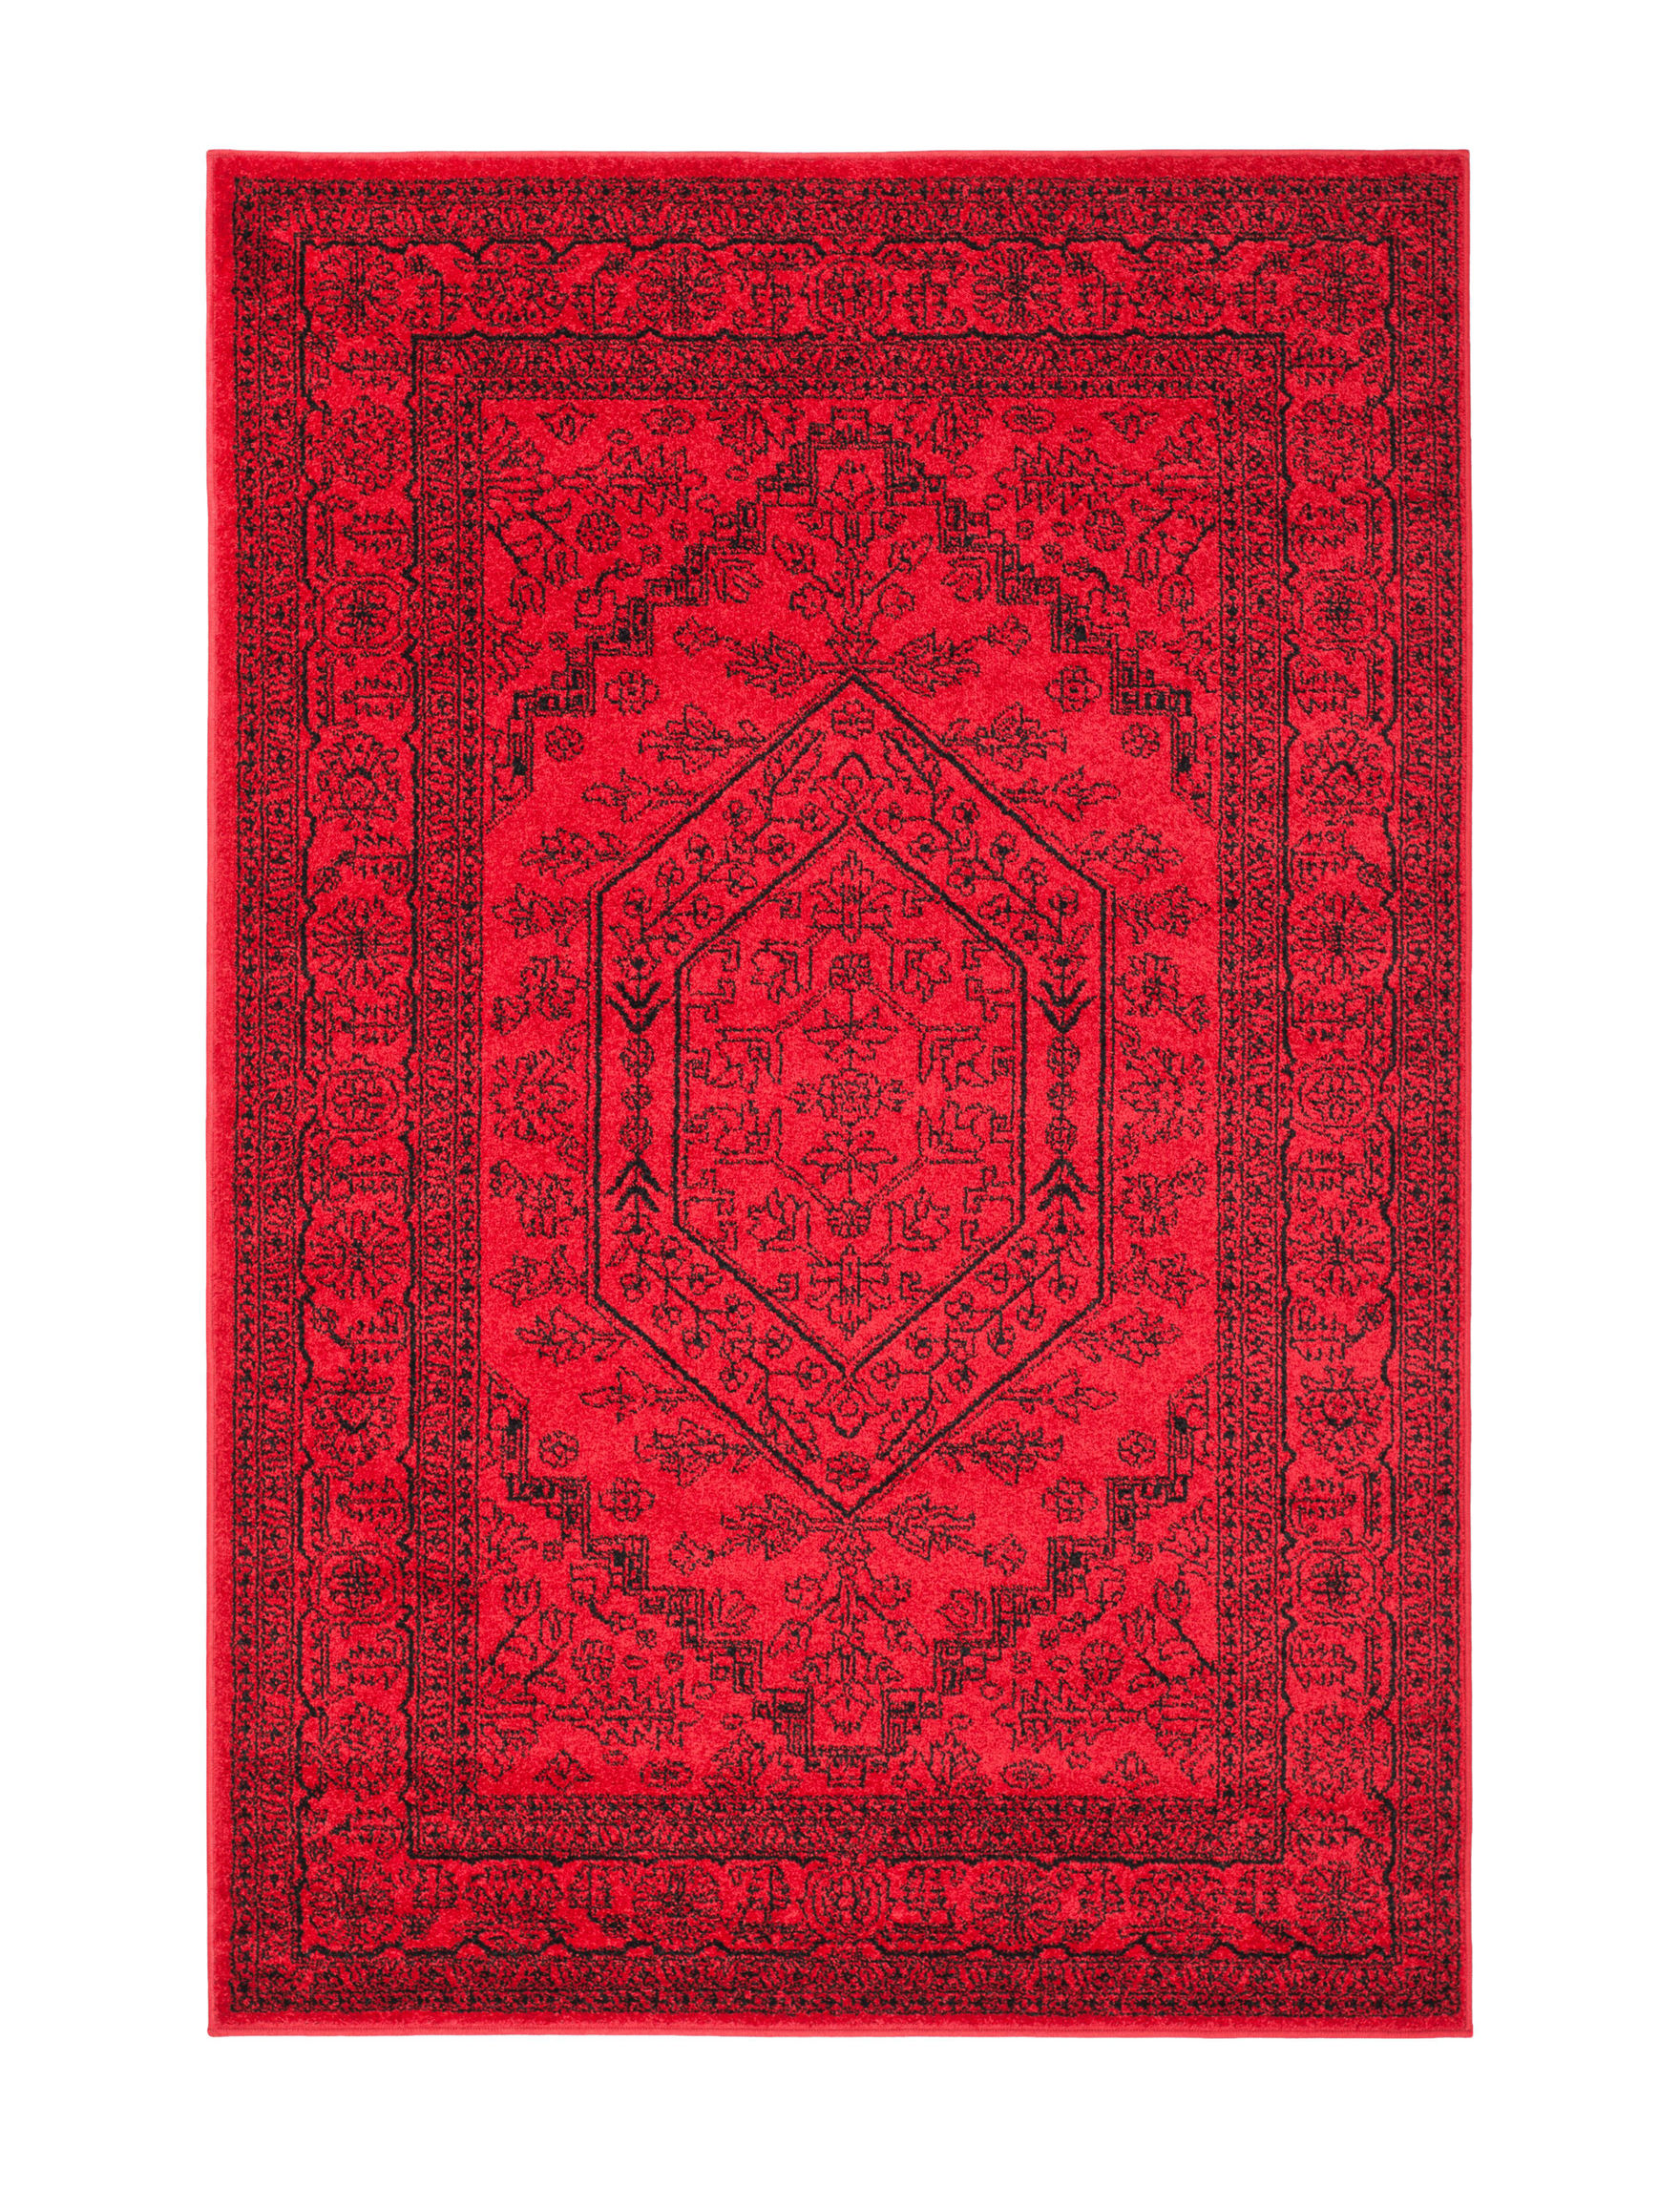 Safavieh Red / Black Area Rugs Rugs